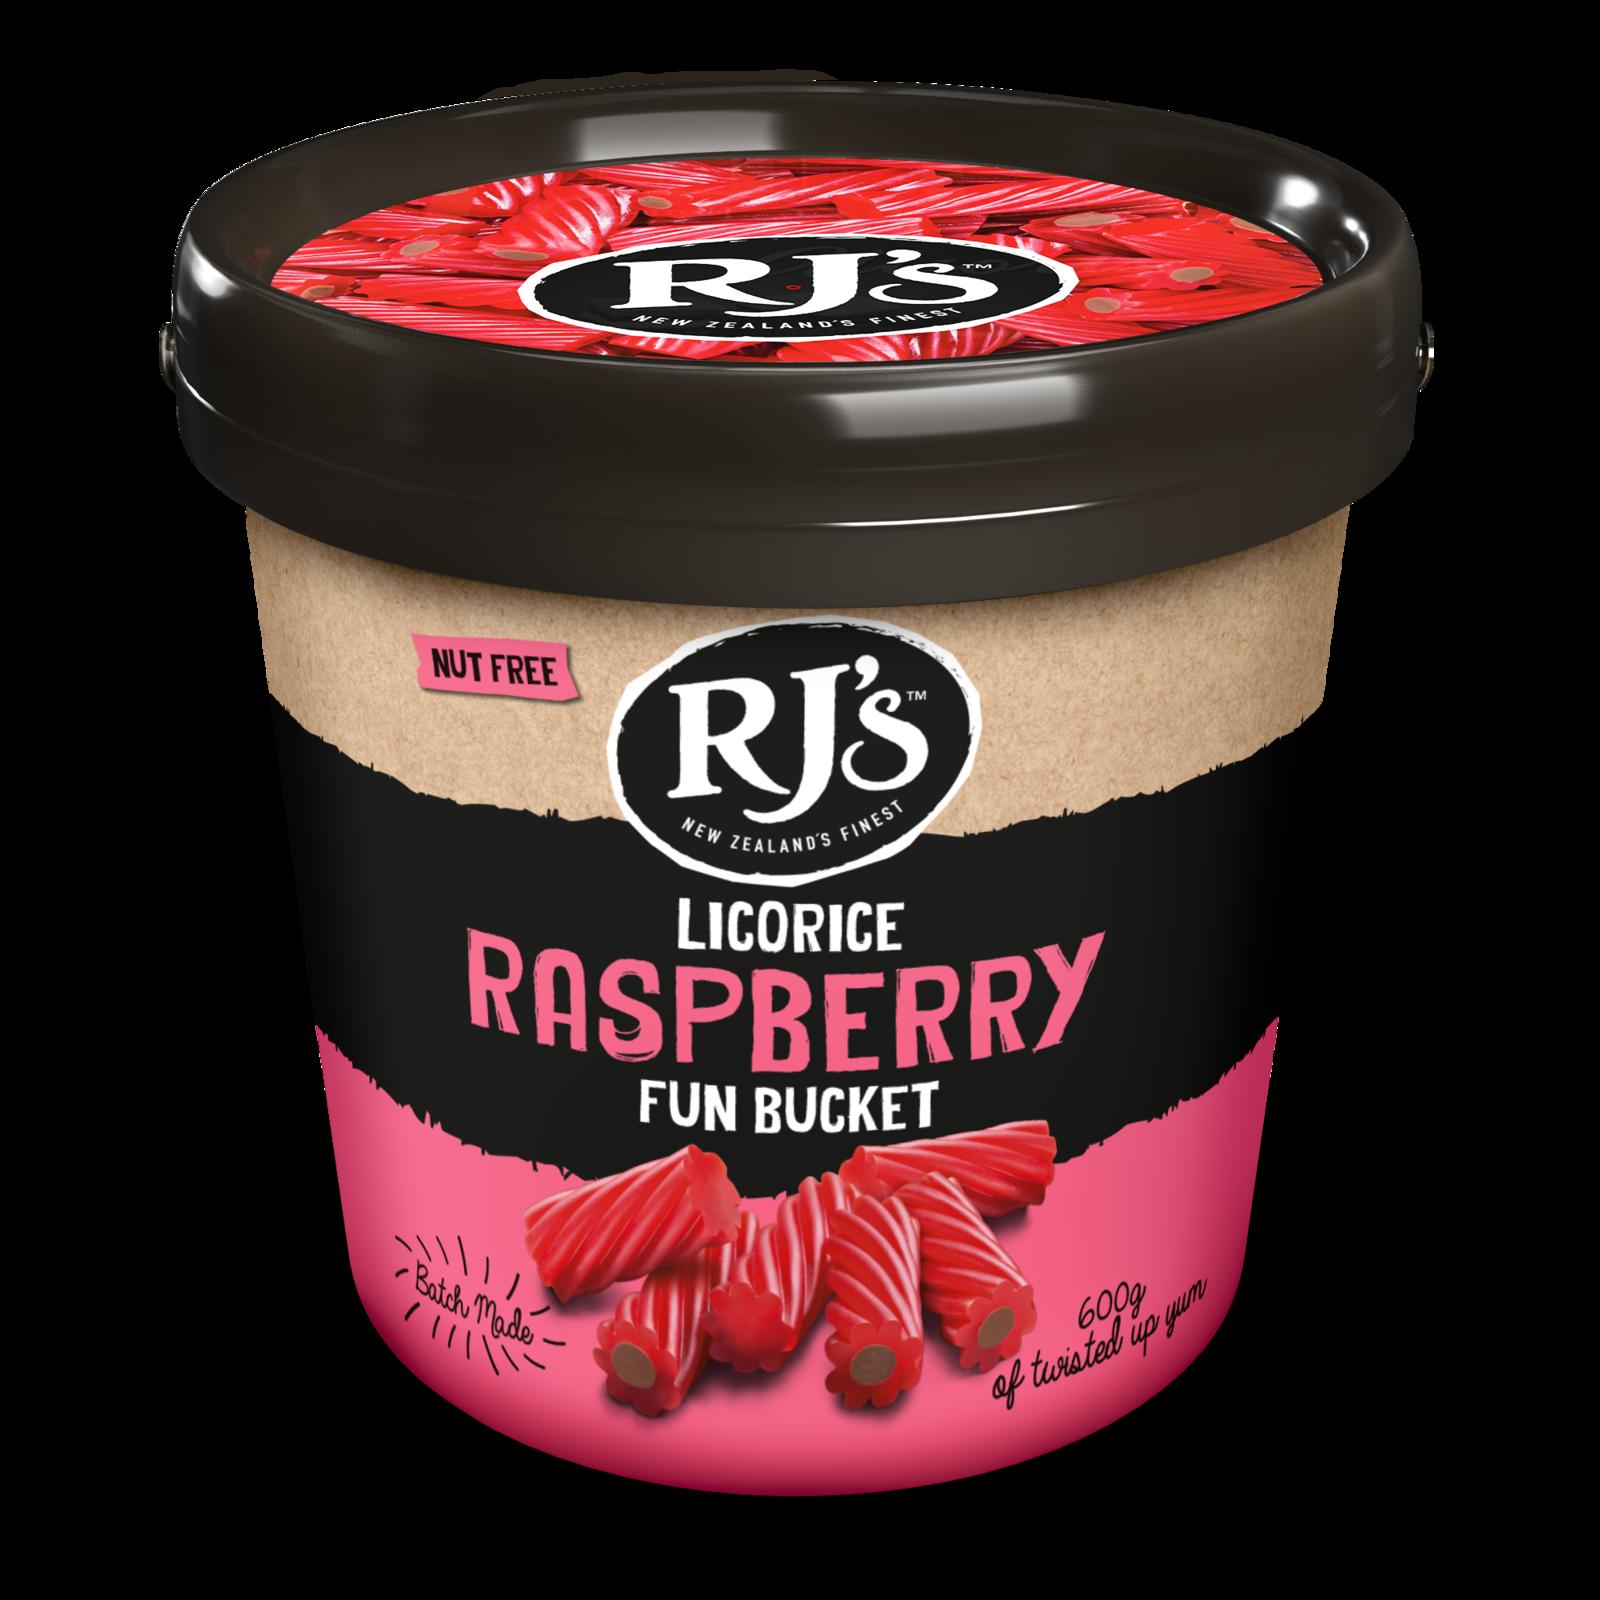 RJ's Licorice Raspberry Fun Bucket 600g 4pk image